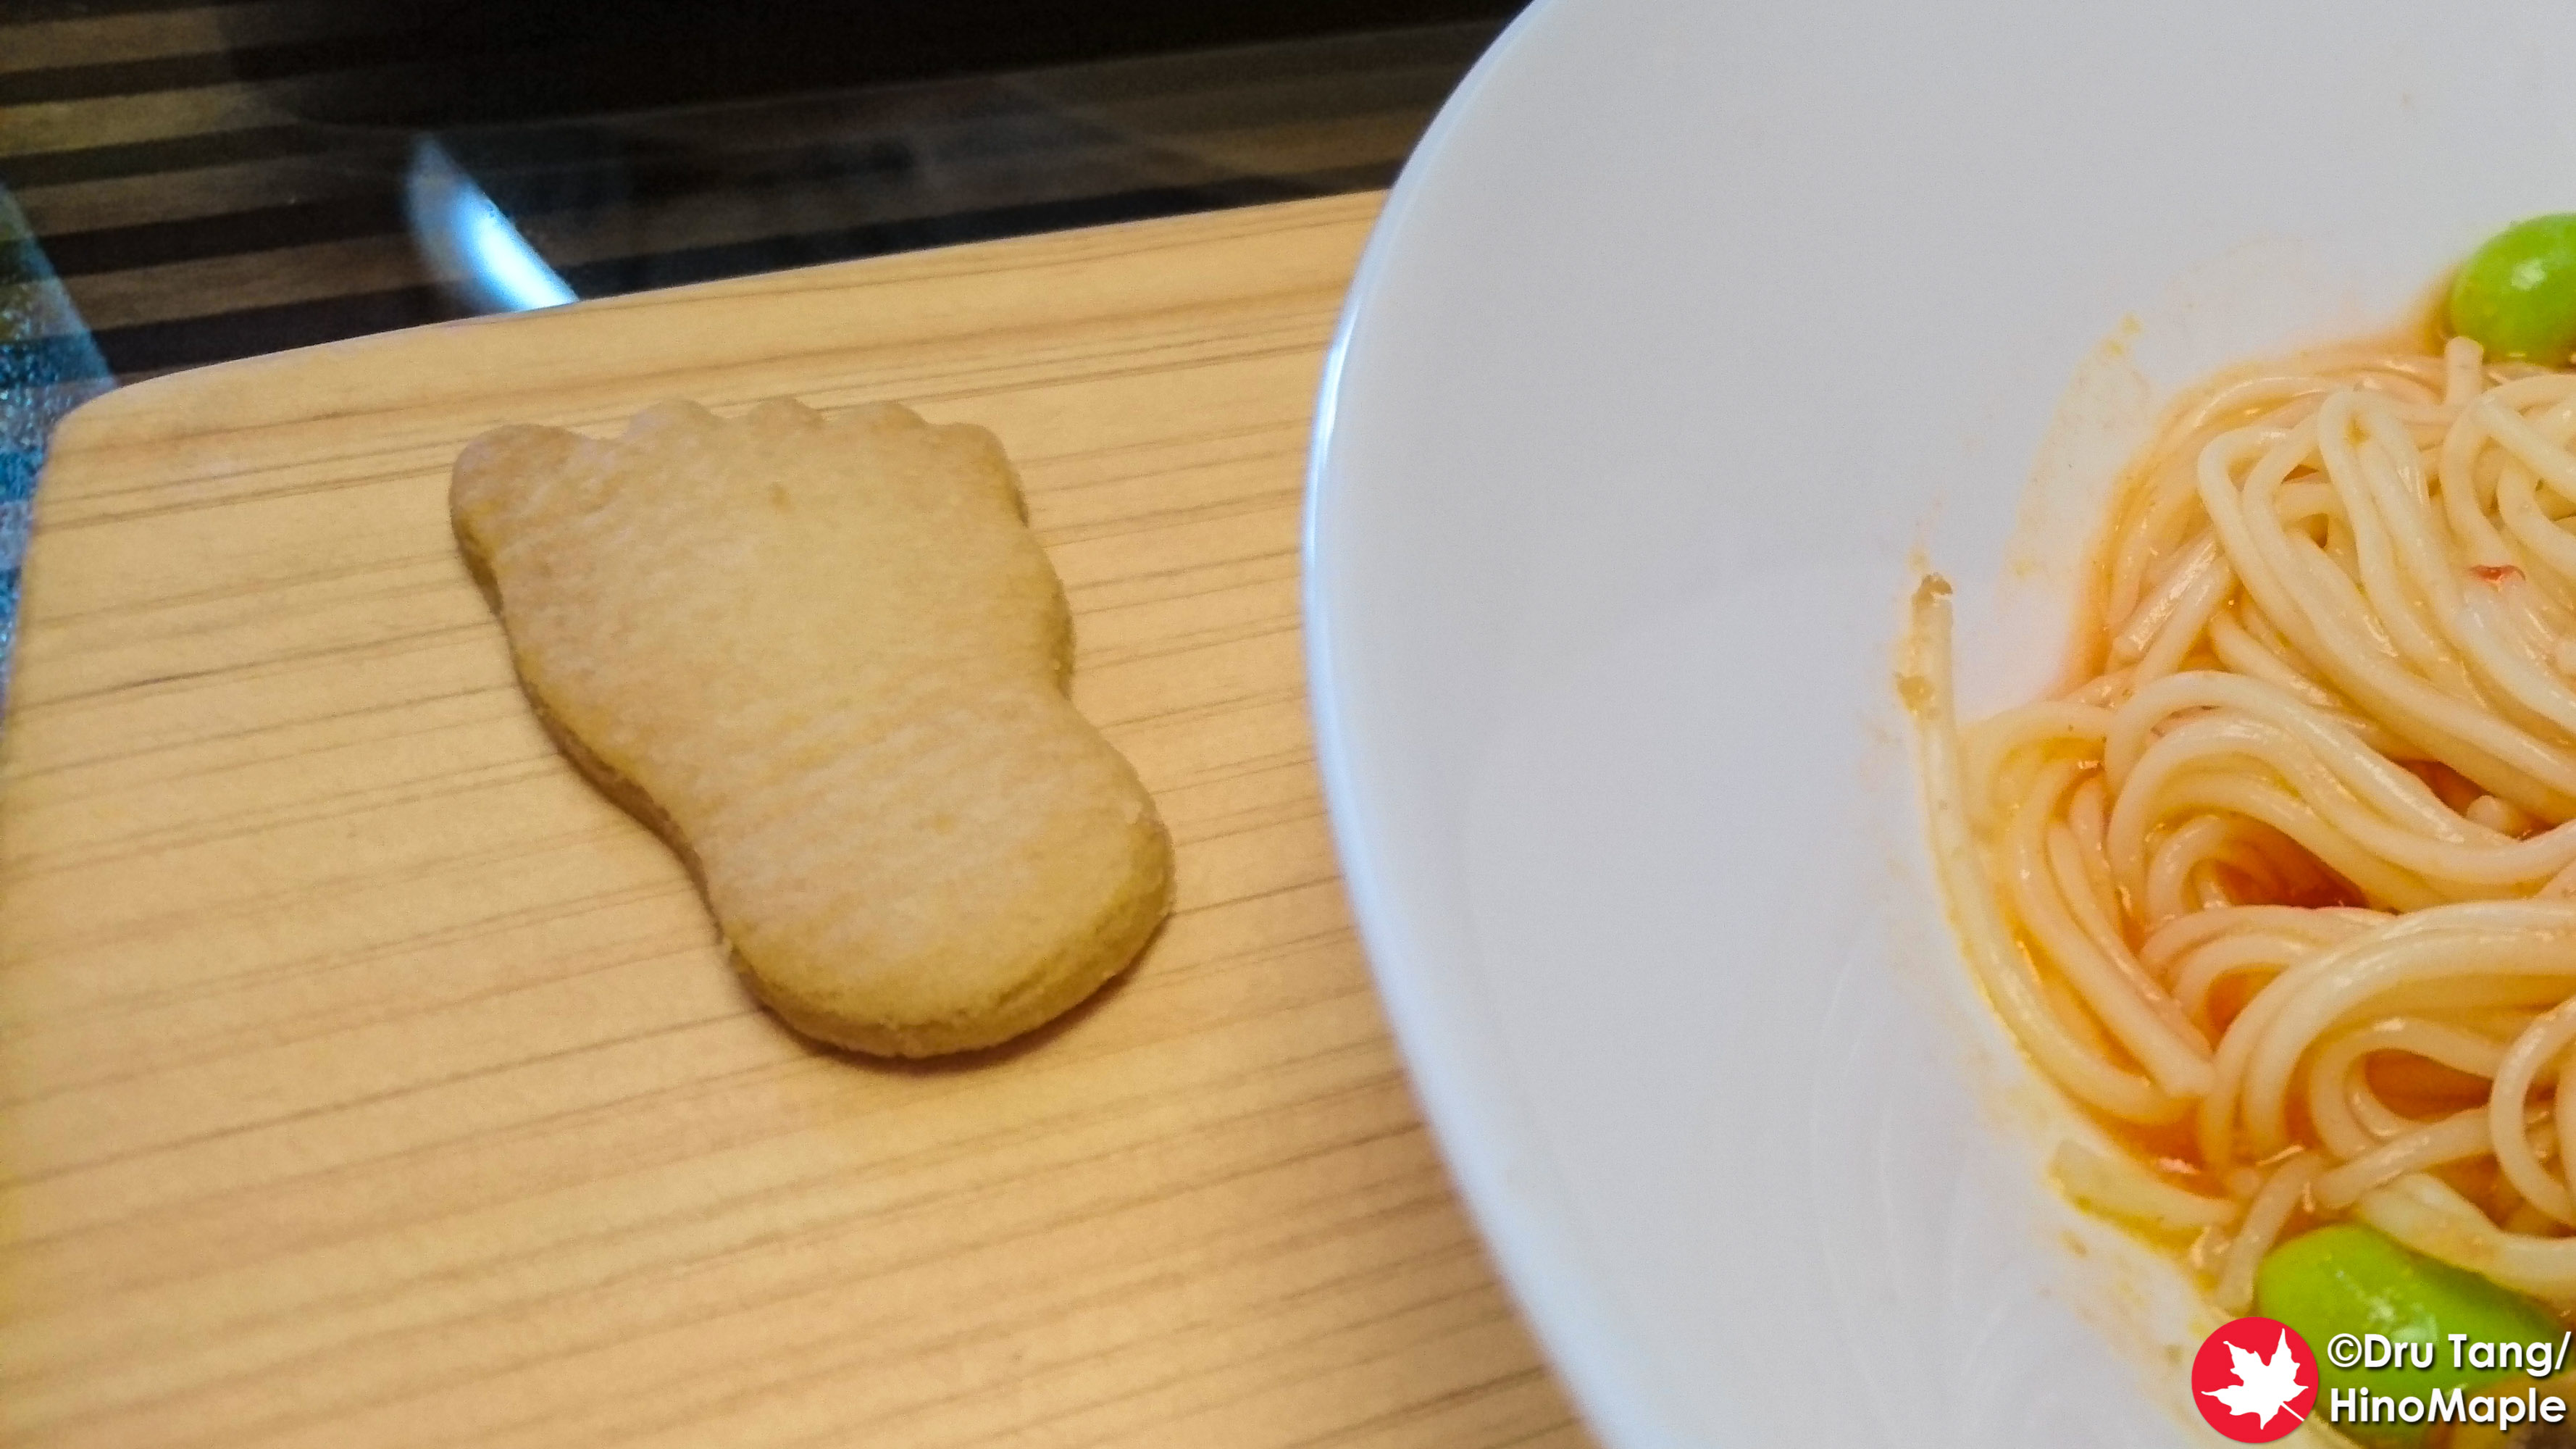 Setouchi Triennale - Setouchi Gastronomy (Megijima - mg16)